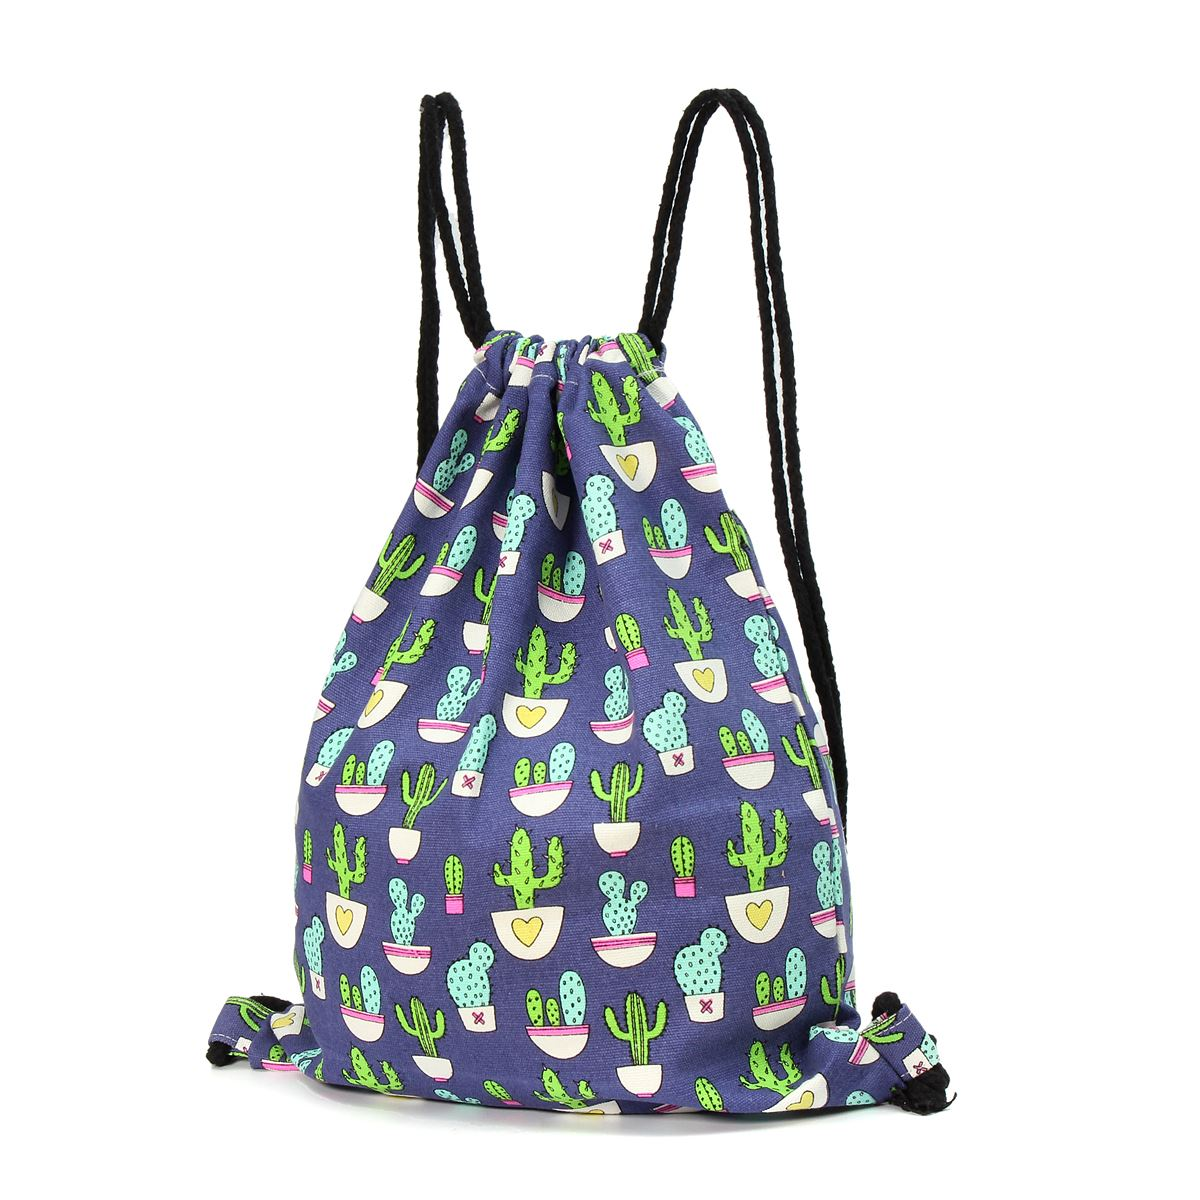 coach shop online outlet ceik  sack bags for girls